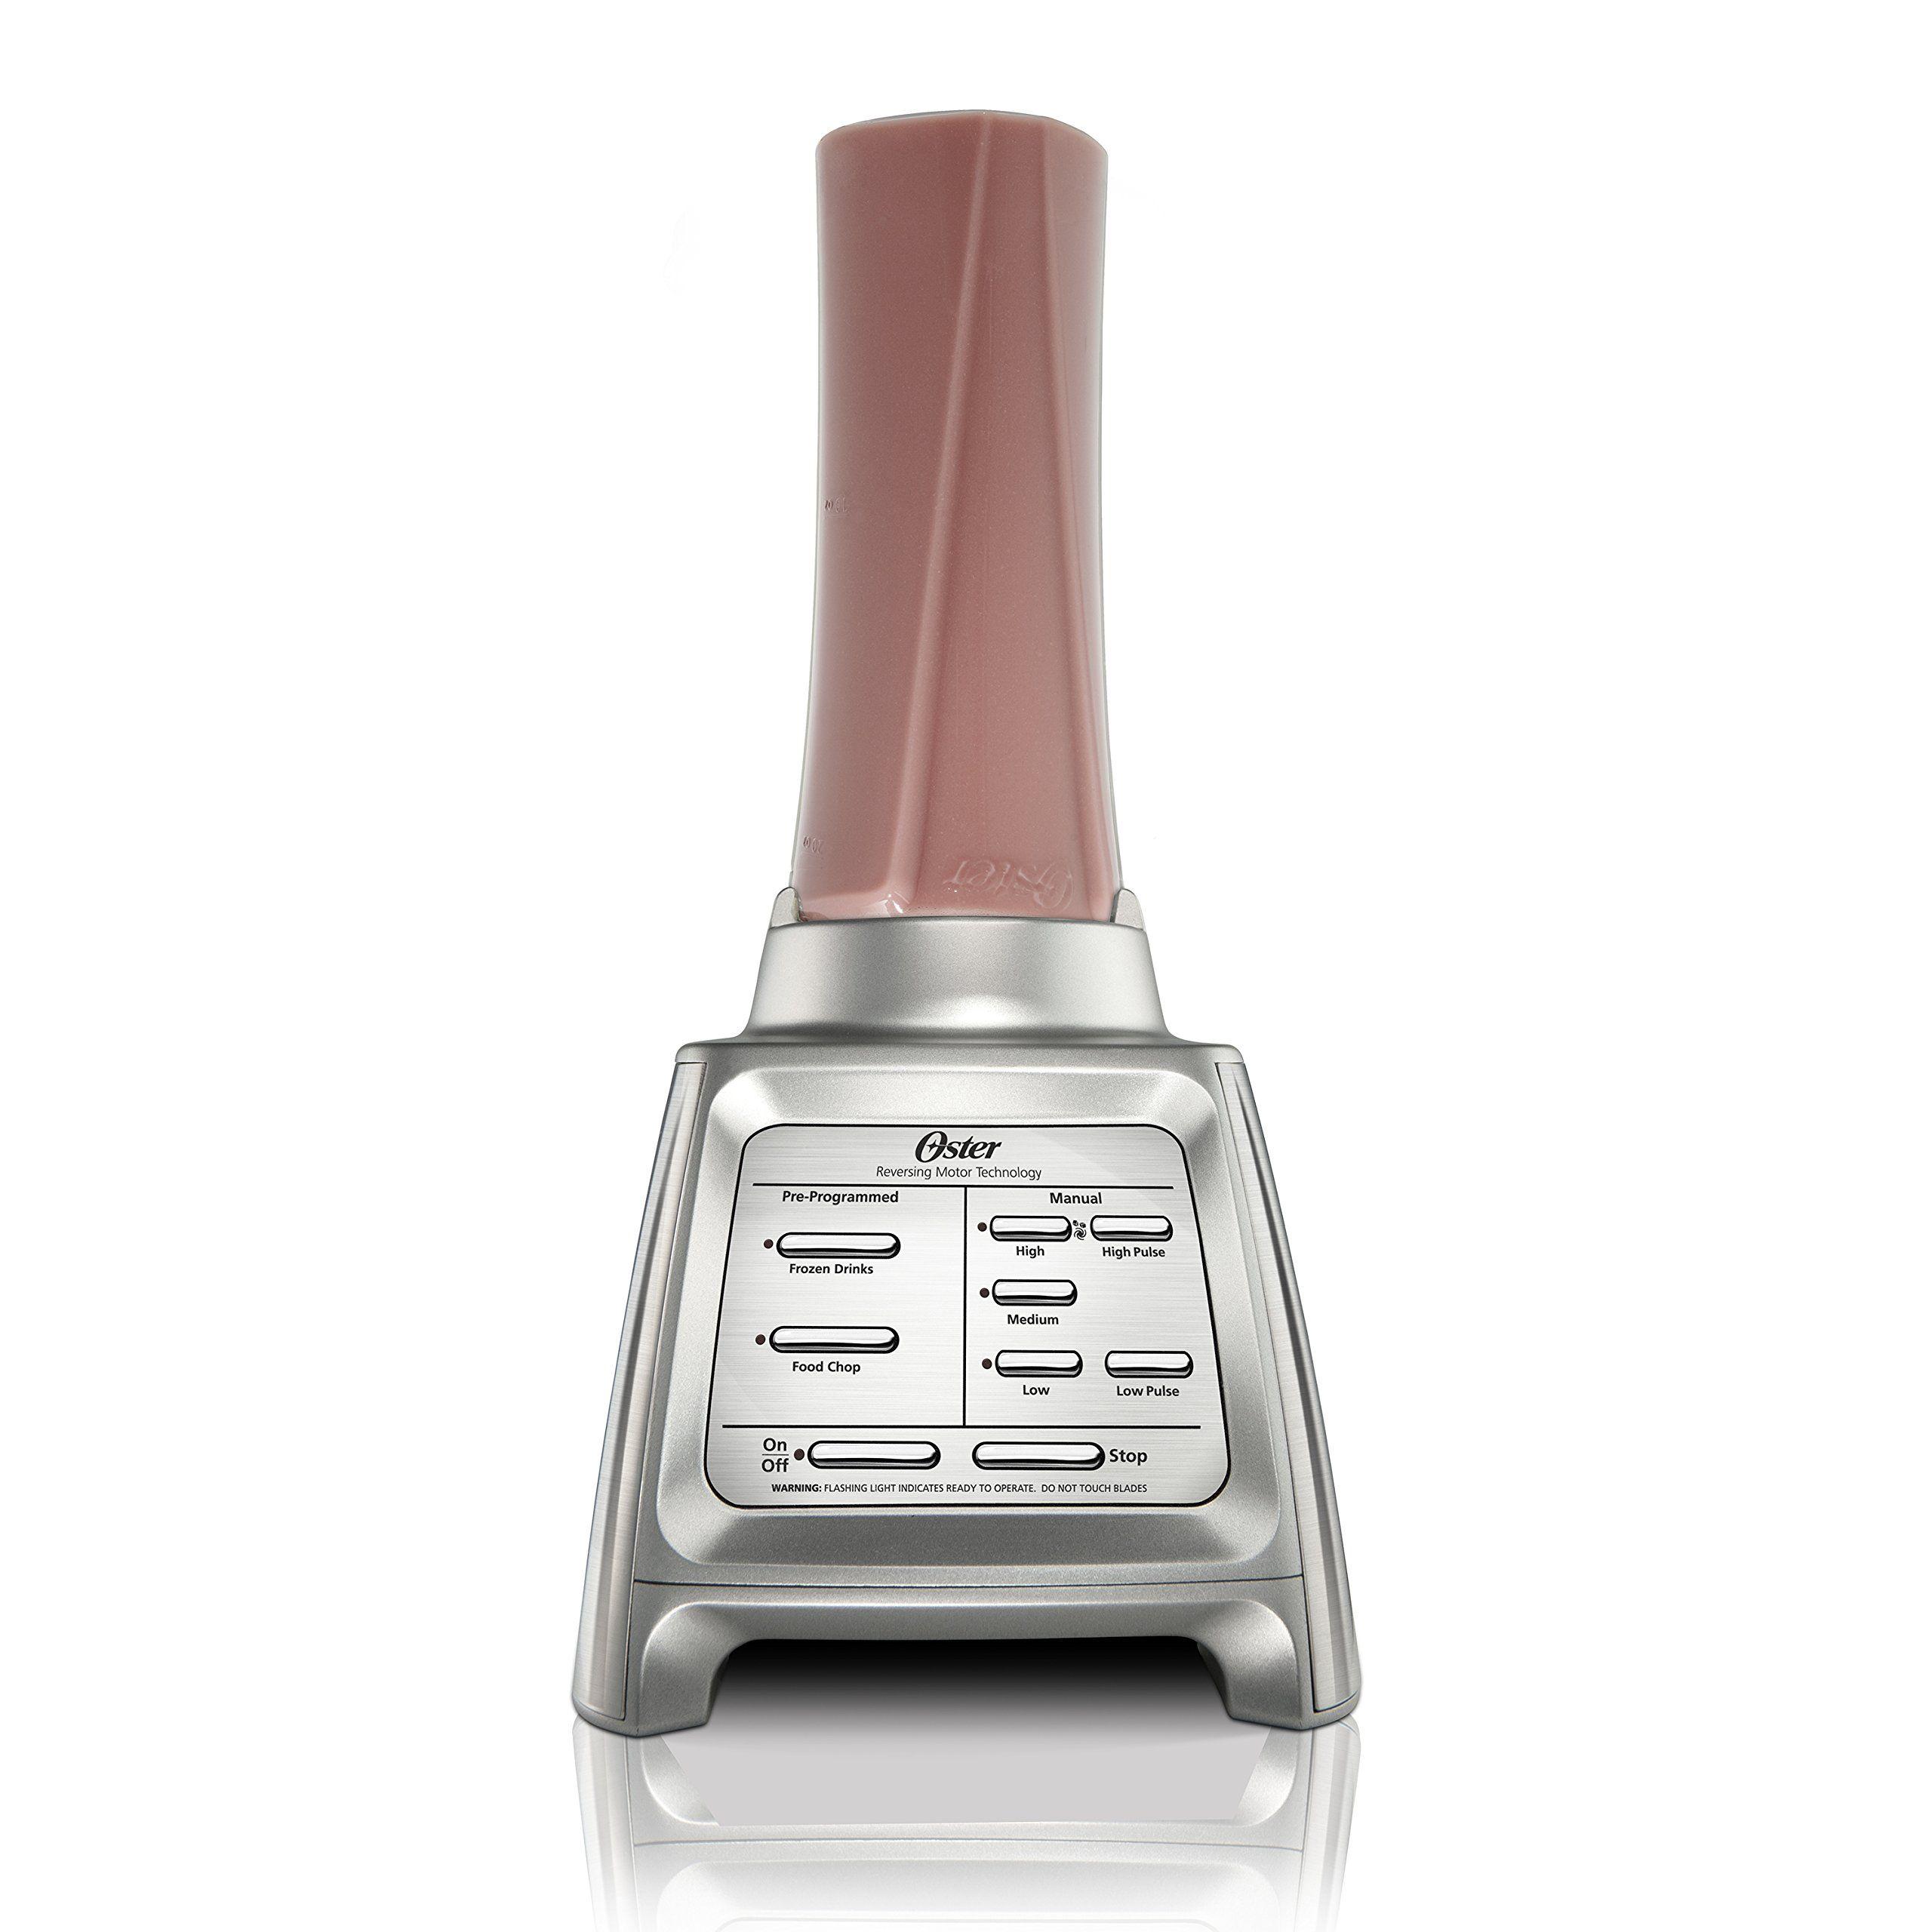 Silver Oster Designed for Life General Blender 13.9 x 10.2 x 8.9 ...